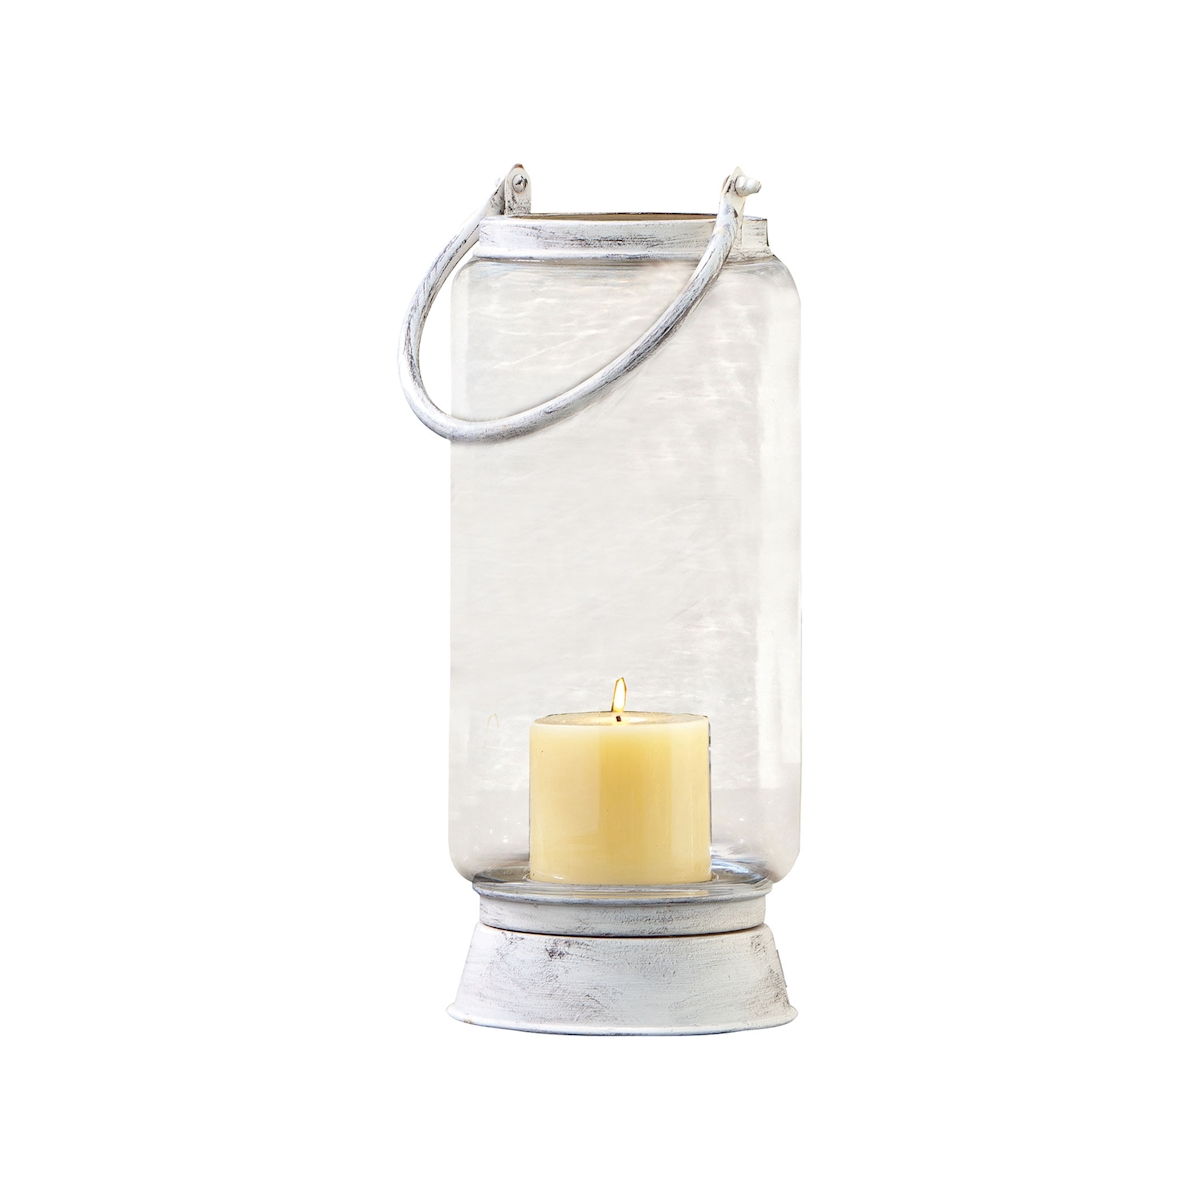 Pomeroy Taos Large Lantern in Antique White 401350